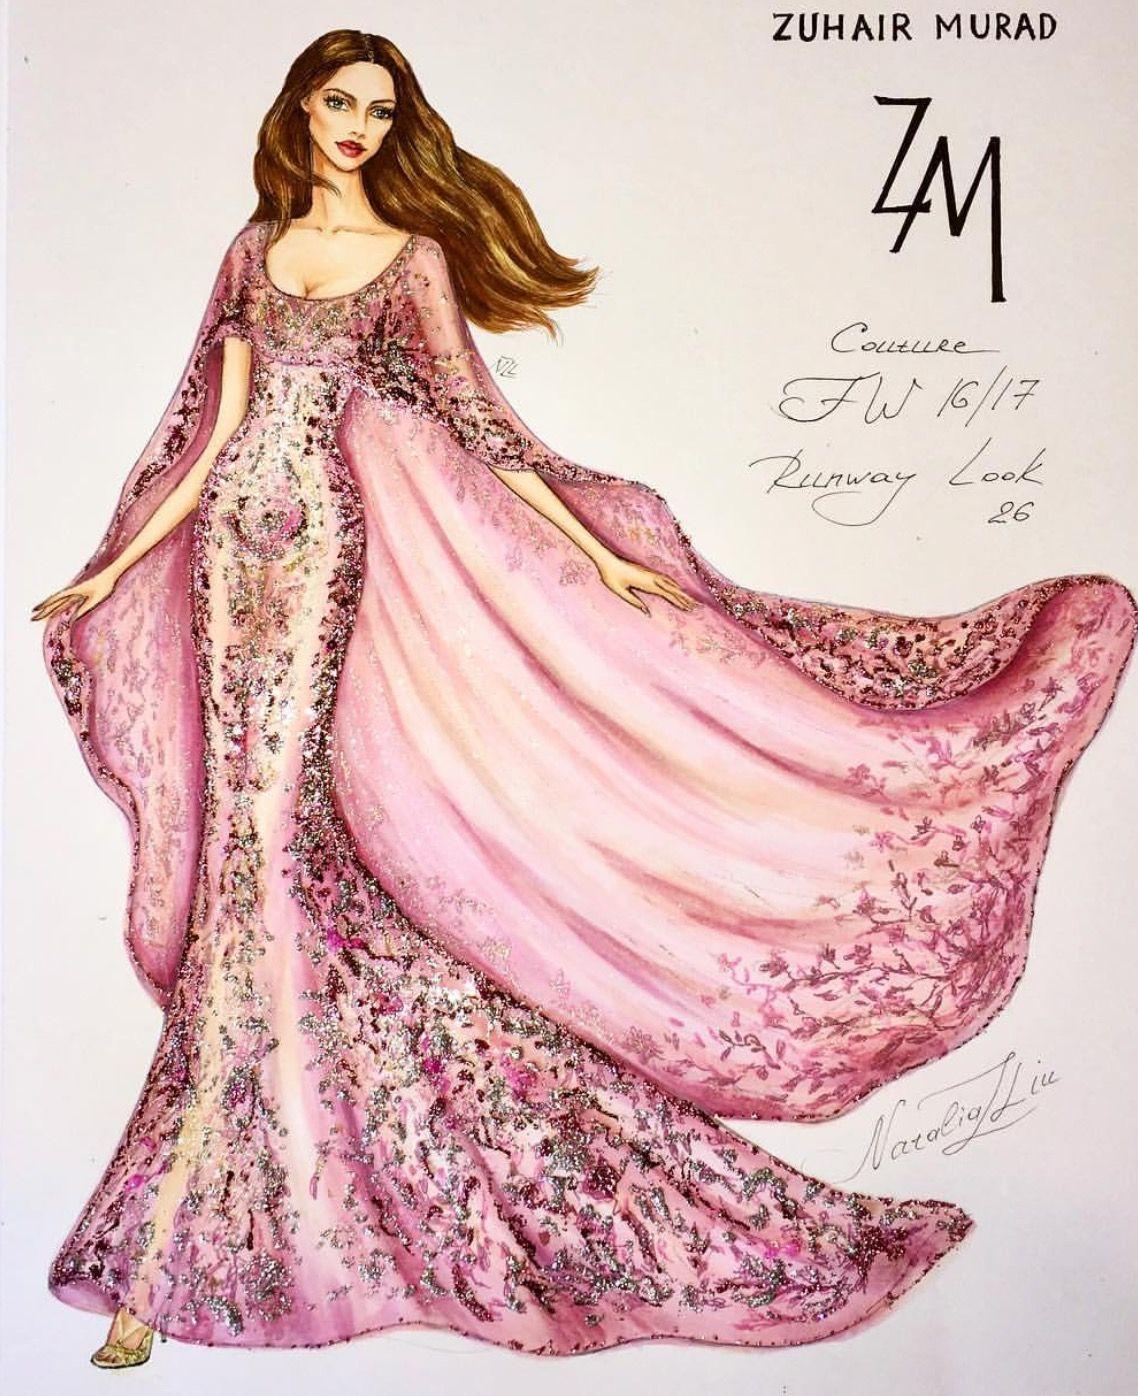 Pin de Pamella Lima en Croquis de Moda   Pinterest   Figurin, Dibujo ...